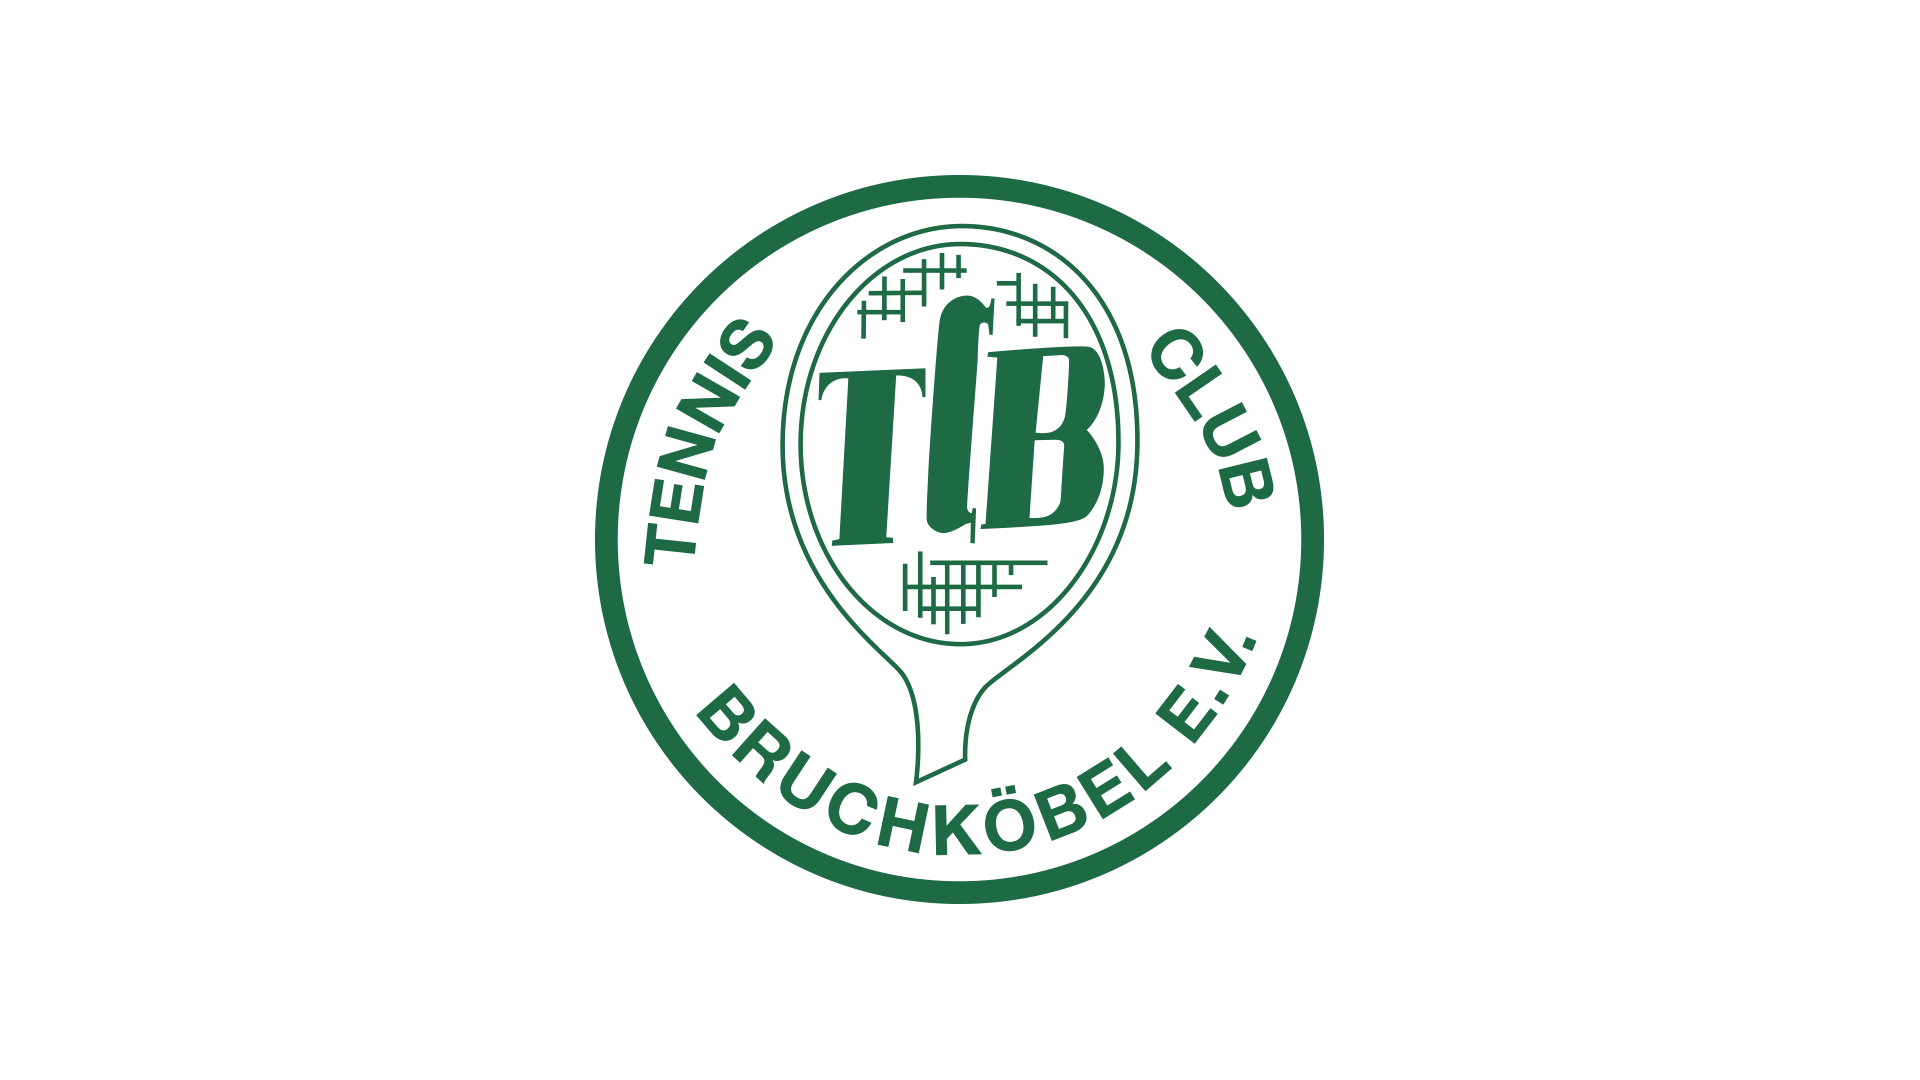 Spielbericht Herren 40 II gegen RW Fulda vom 5.9.